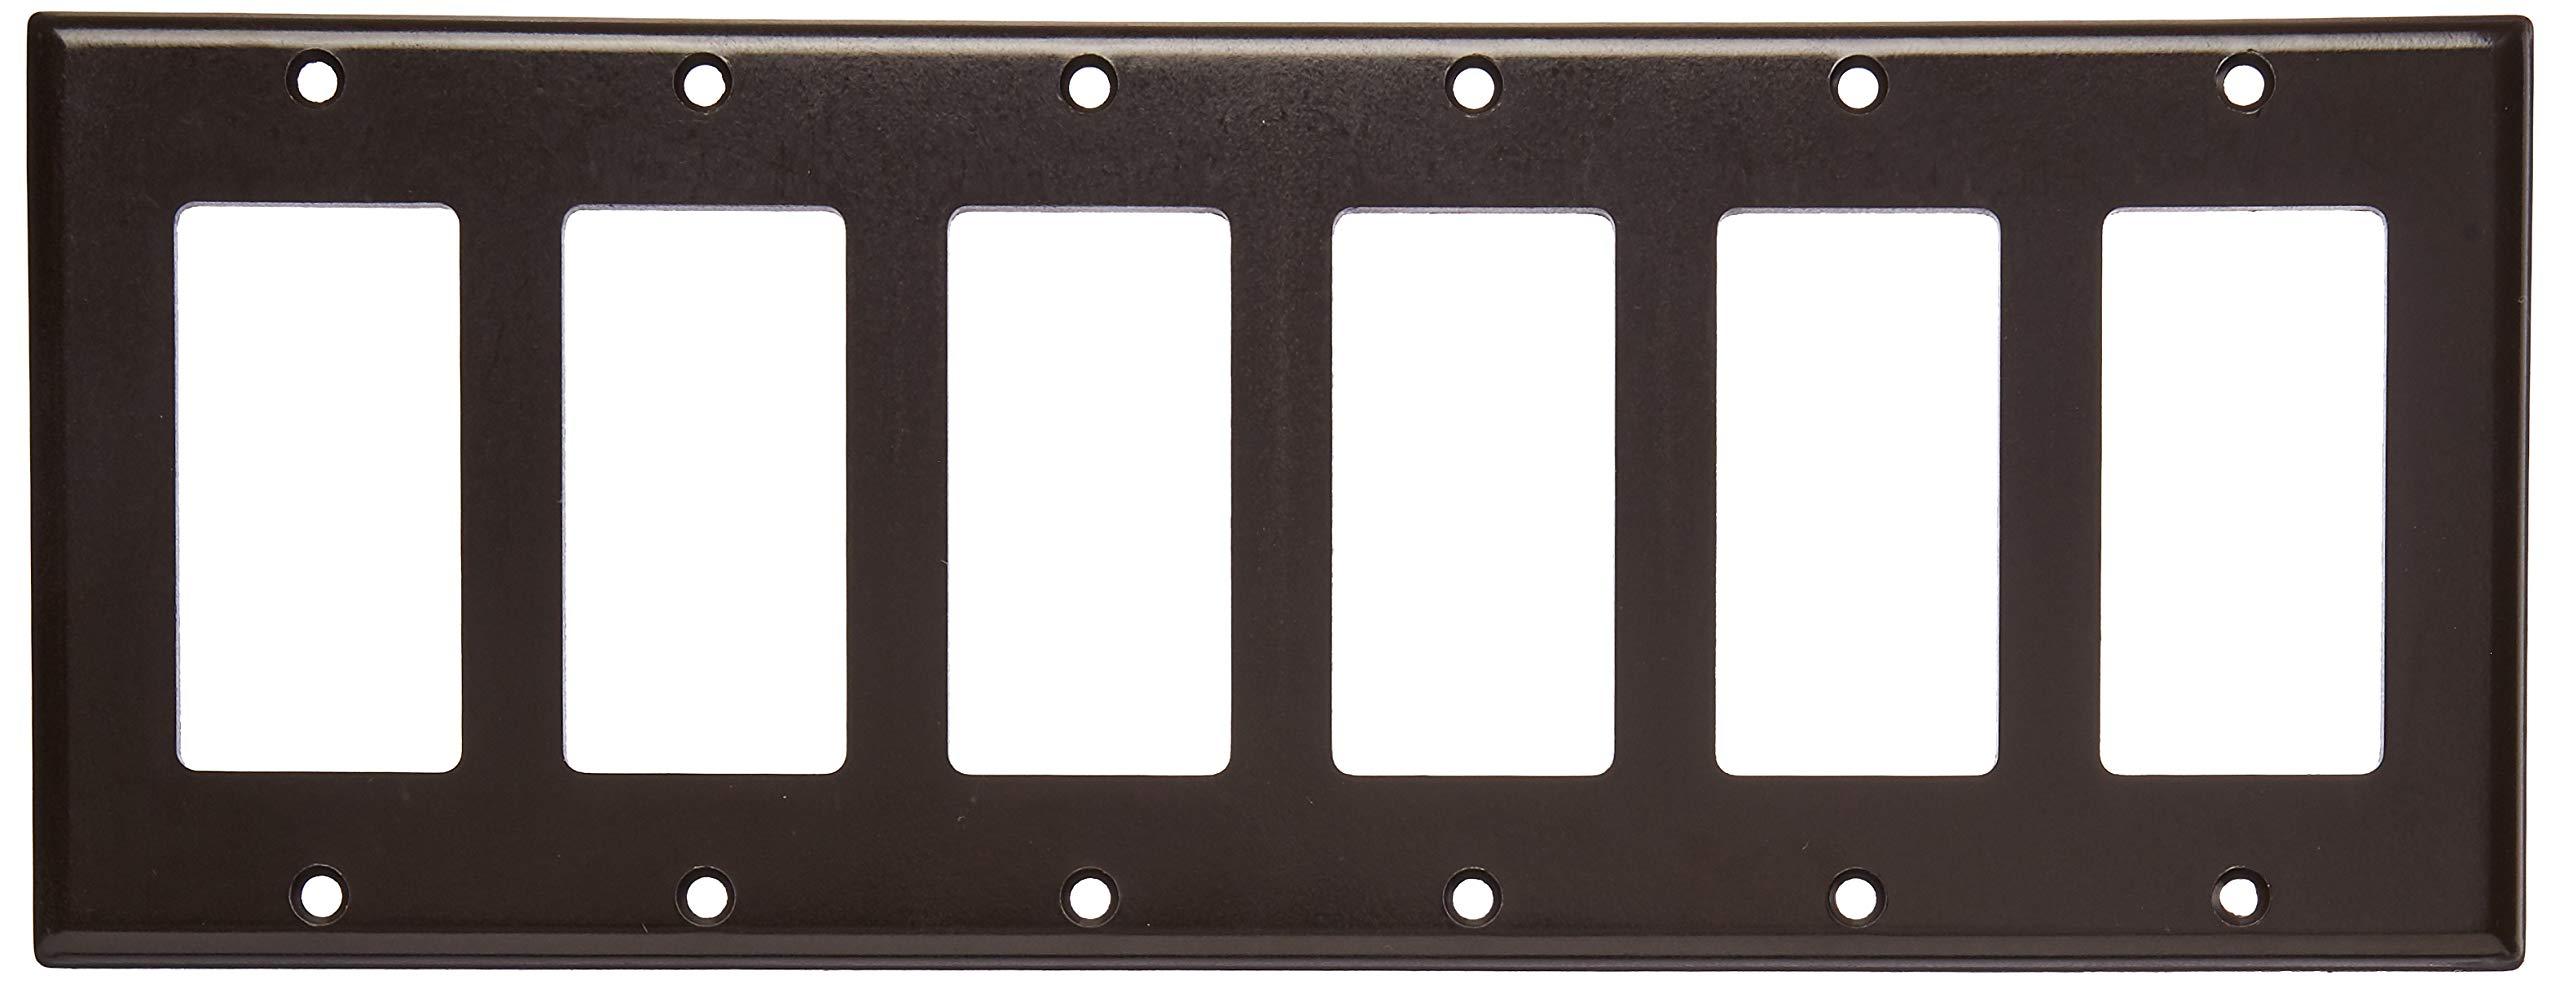 Leviton 80436 6-Gang Decora/GFCI Device Decora Wallplate, Standard Size, Thermoset, Device Mount, Brown, 10-Pack